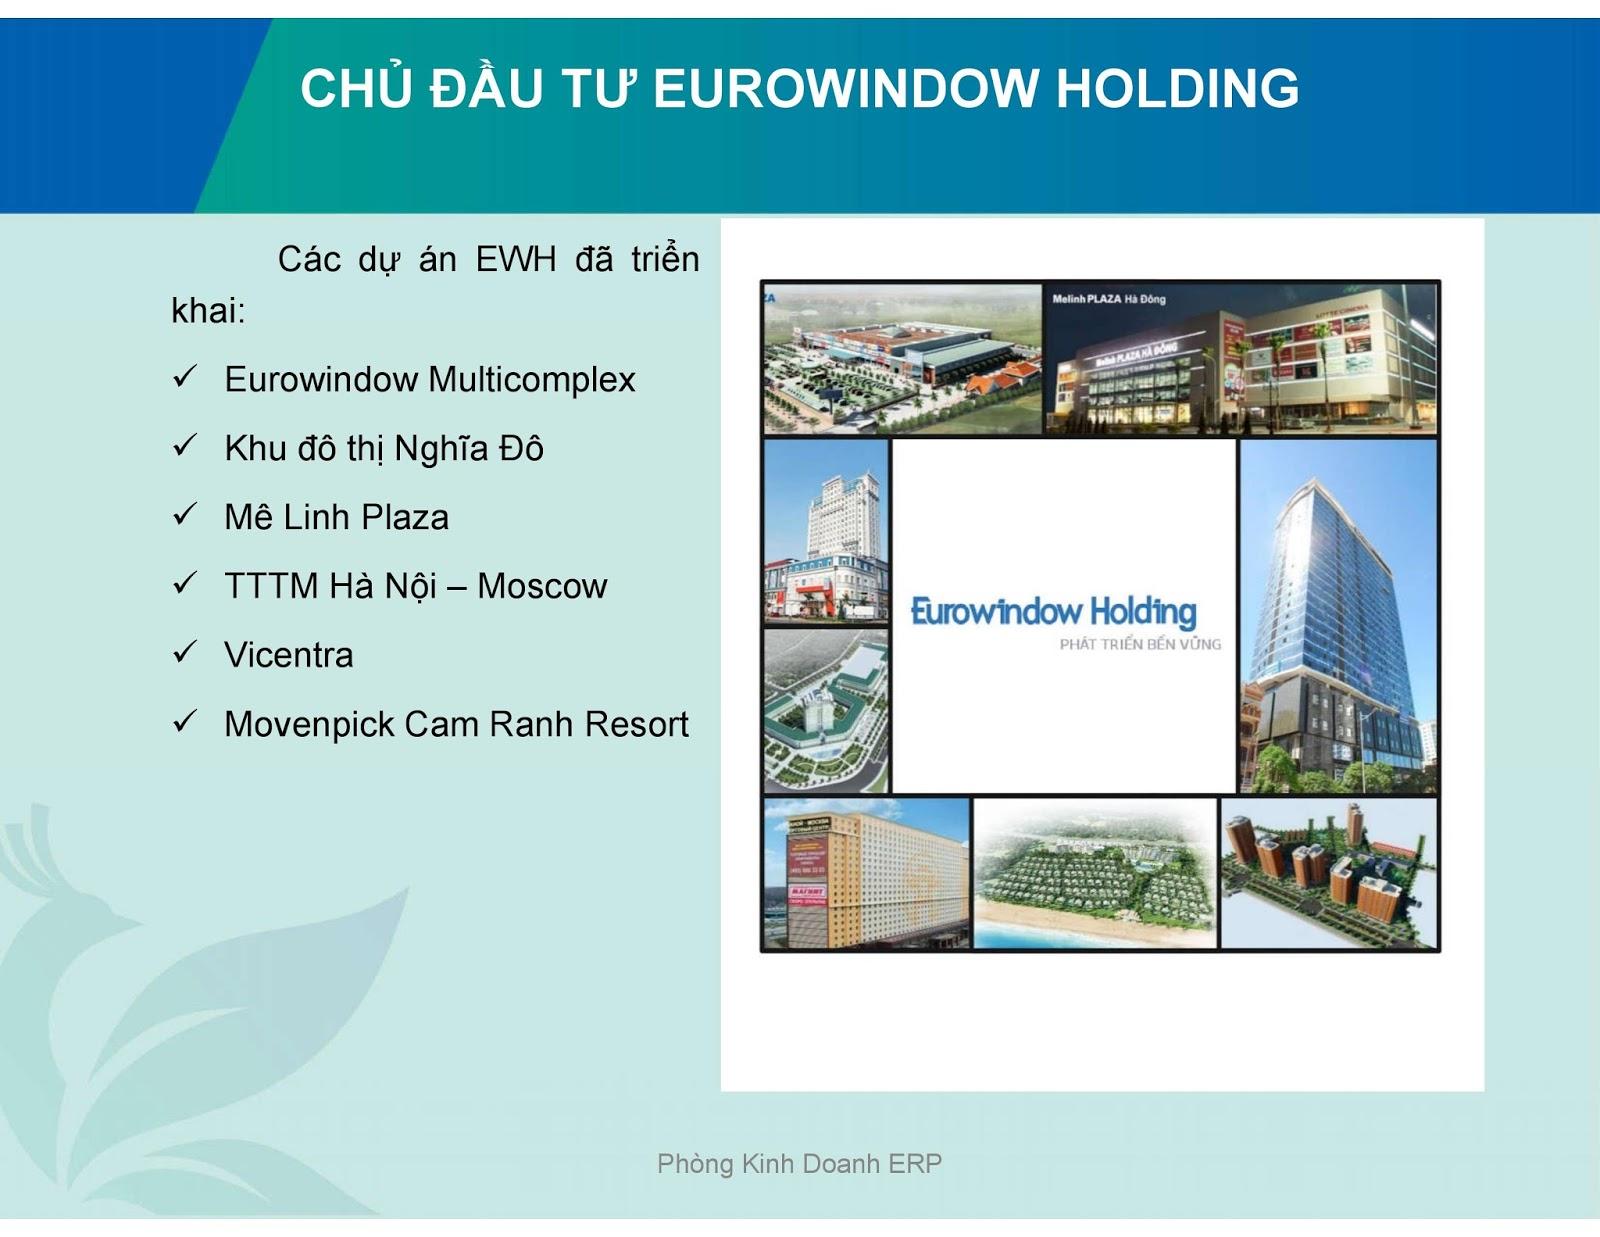 Chủ đầu tư Eurowindow River Park